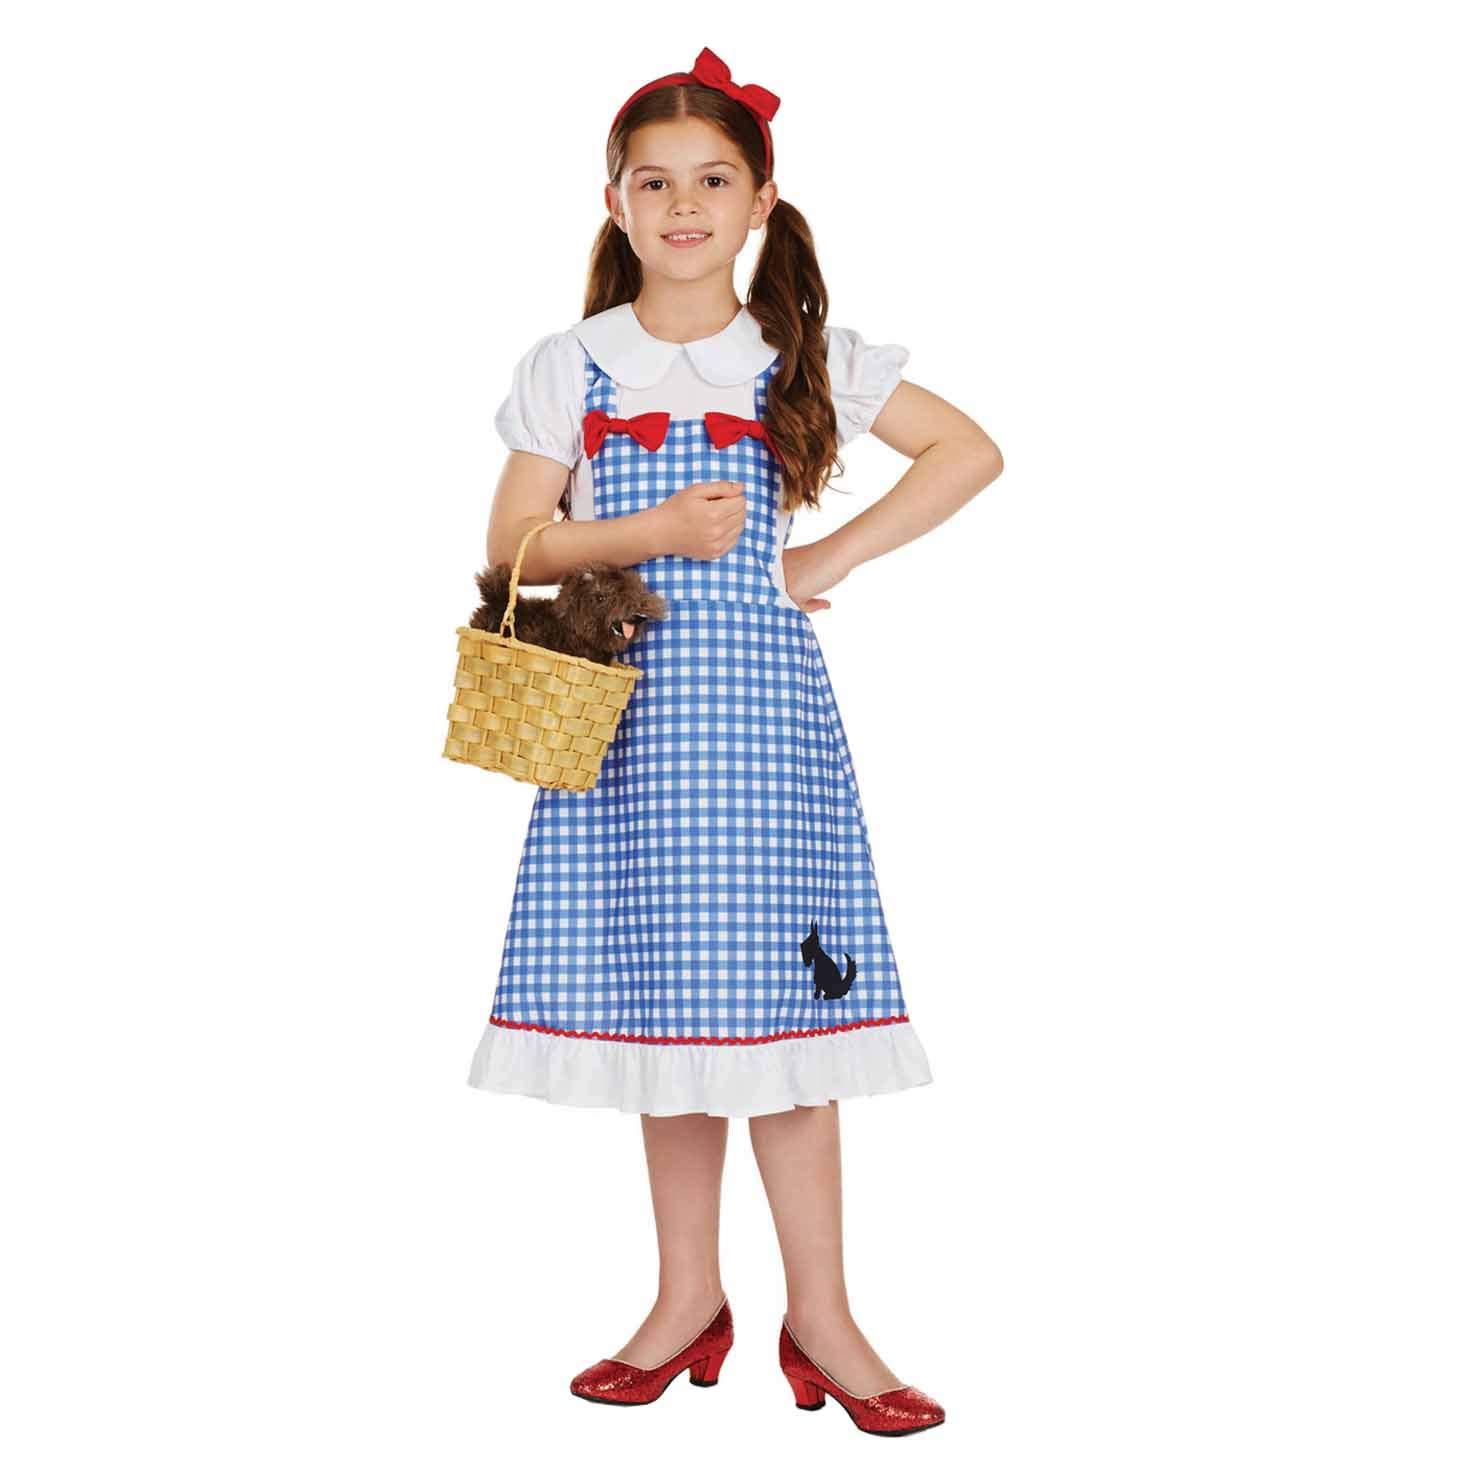 KANSAS GIRL COSTUME WITH BASKET GIRLS SCHOOL BOOK DAY DOROTHY CHILDS FANCY DRESS